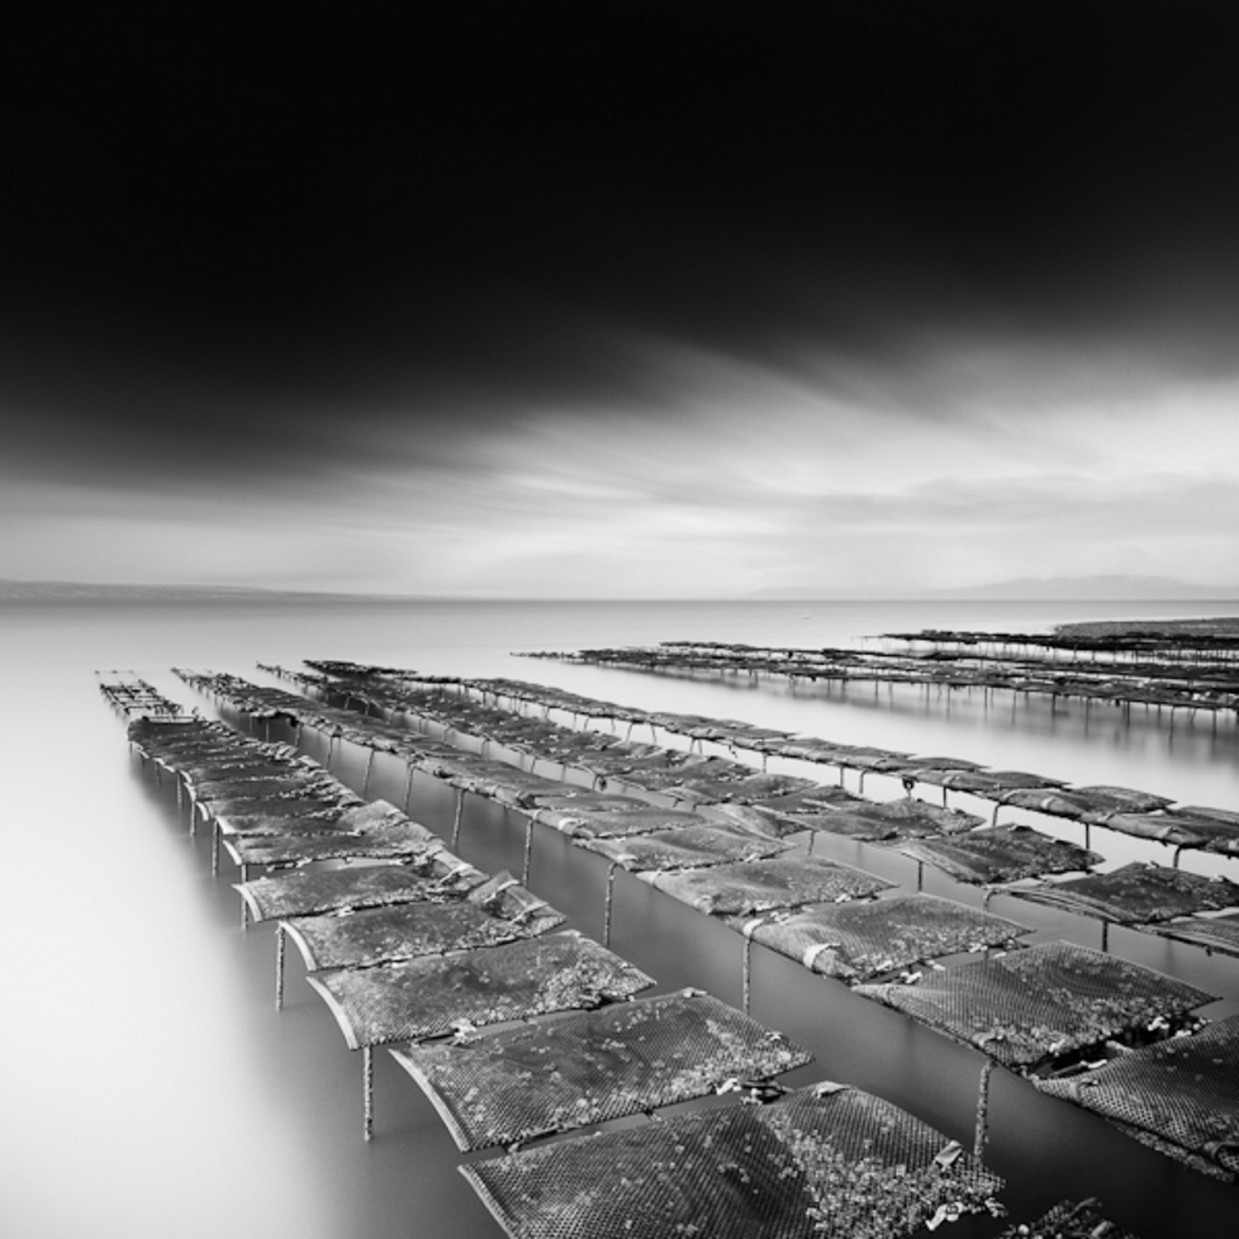 fotograf-Zoltan-Bekefi_8